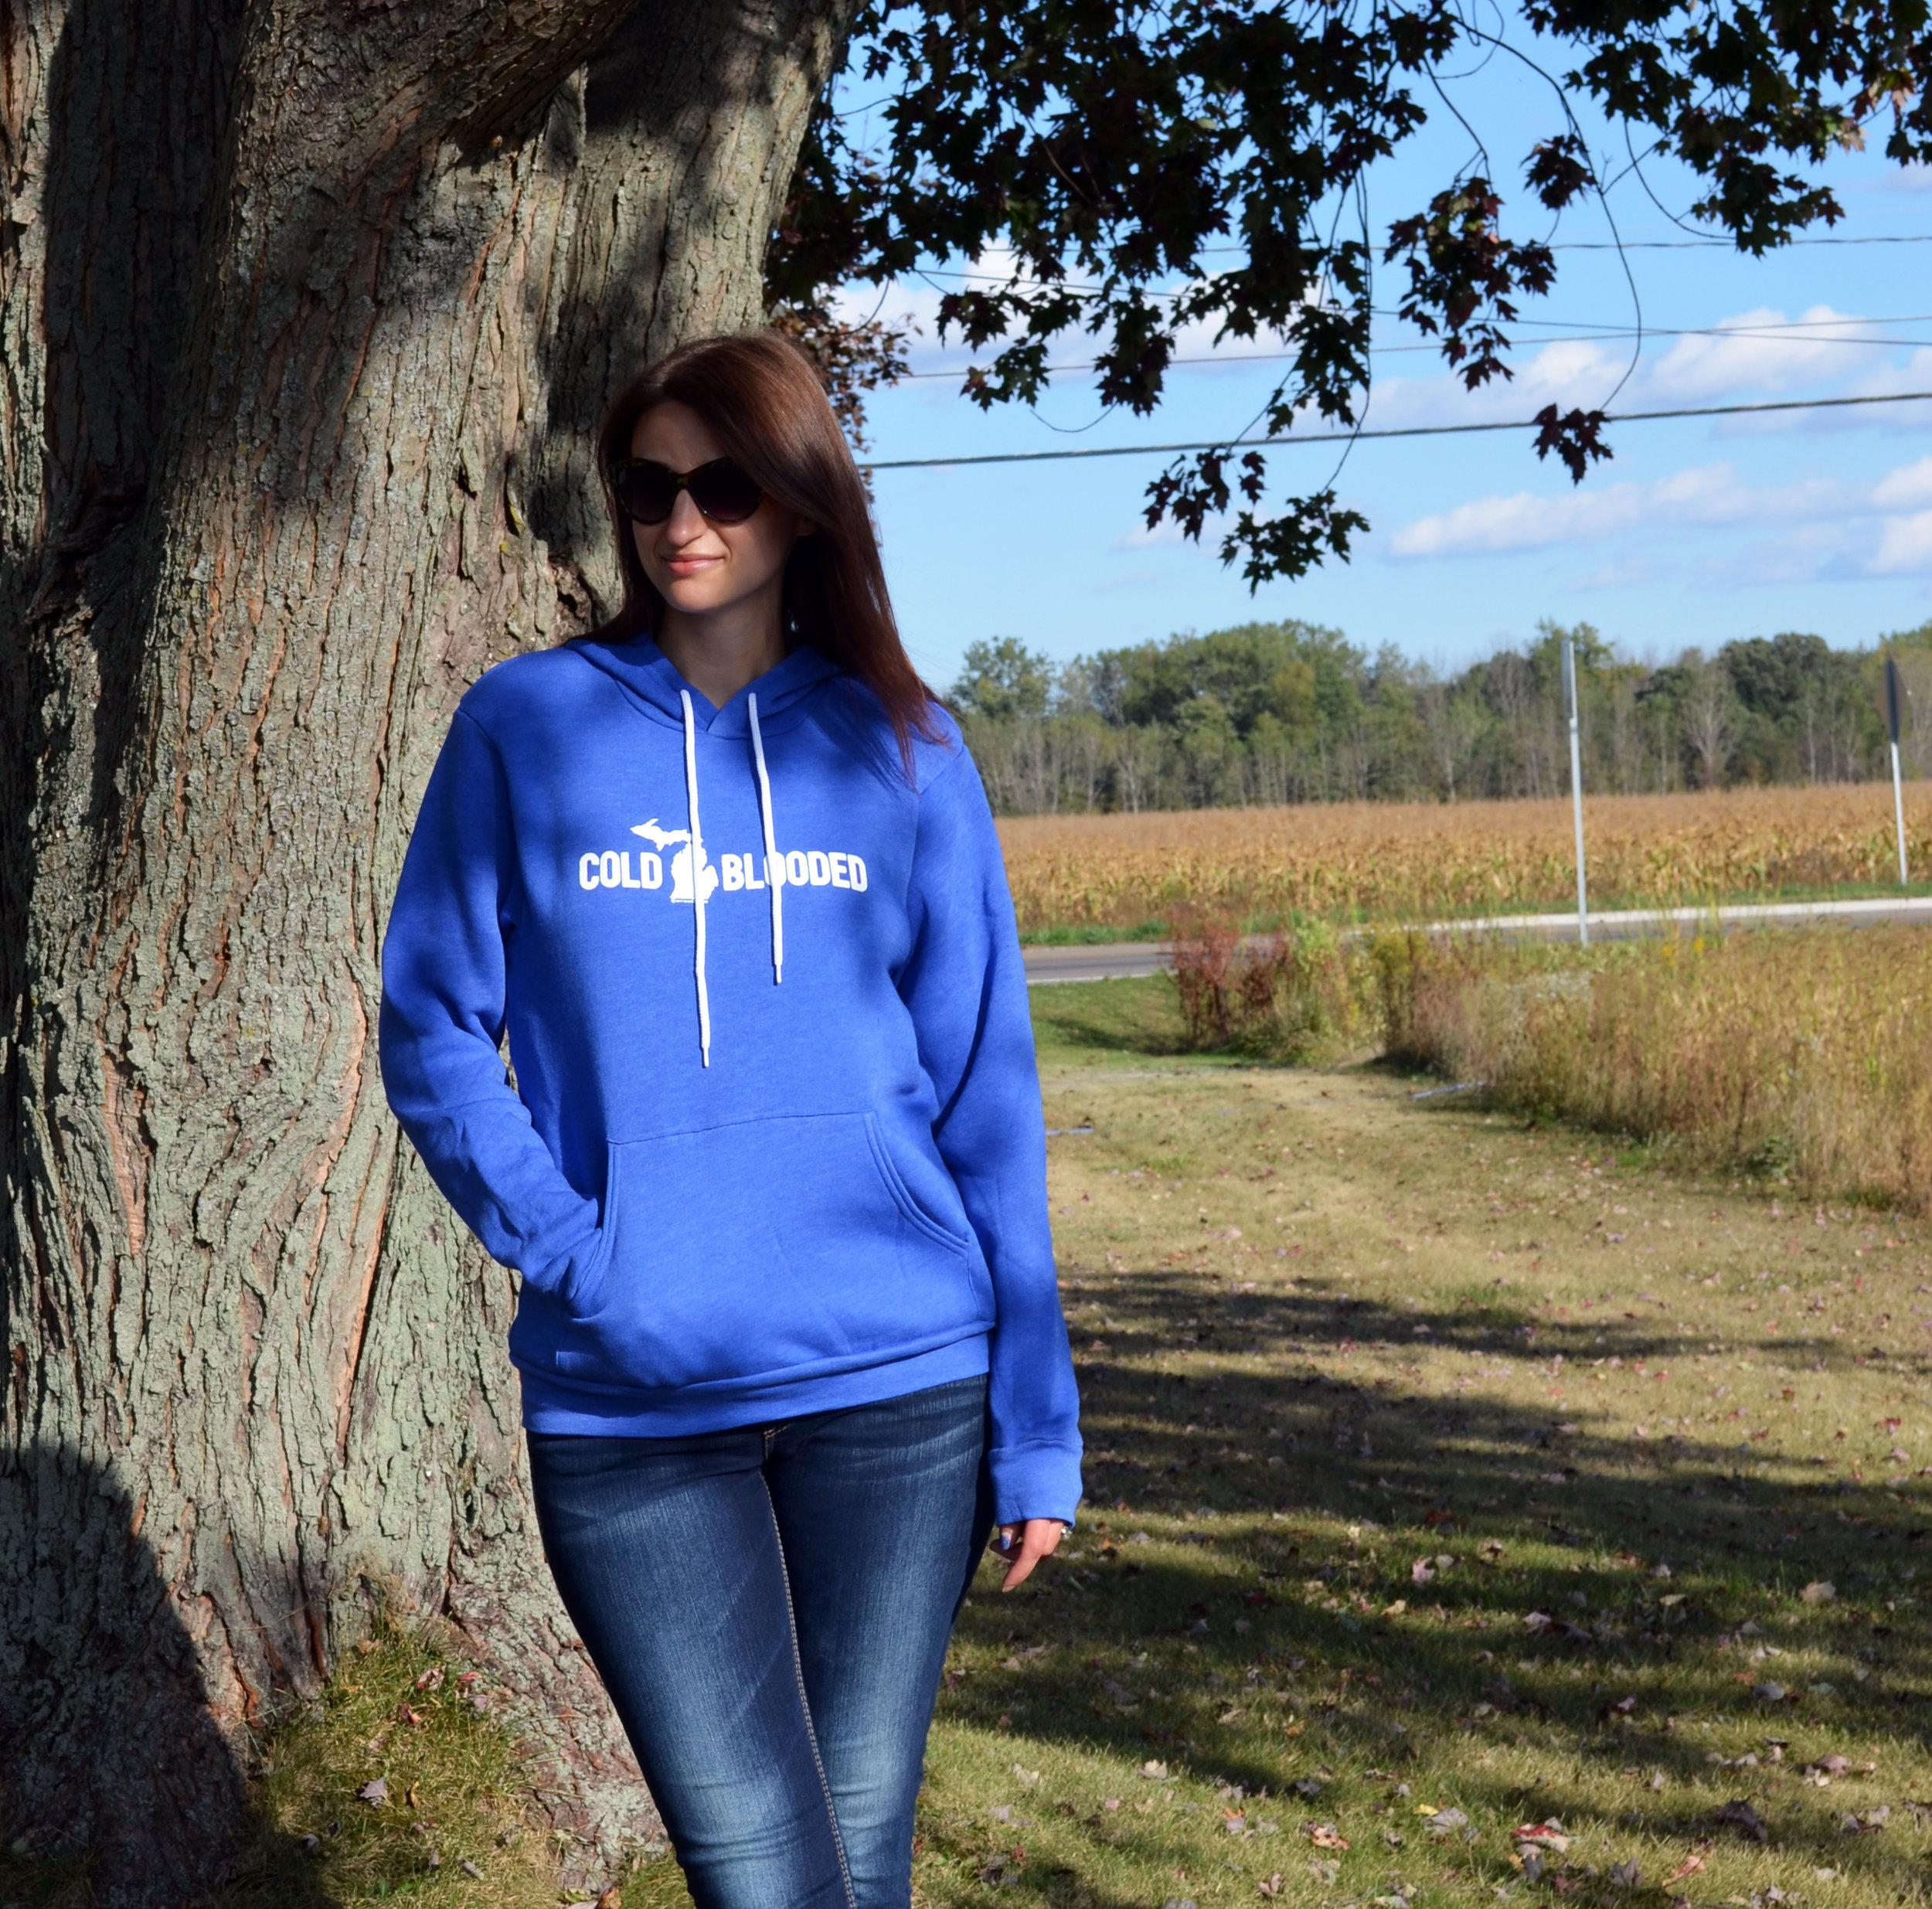 Cold Blooded Unisex Hoodie, Hooded Sweatshirt, Michigan apparel, Michigan hoodie, Michigan winter, Michigan fall, autumn, fall fashion, winter fashion, casual style